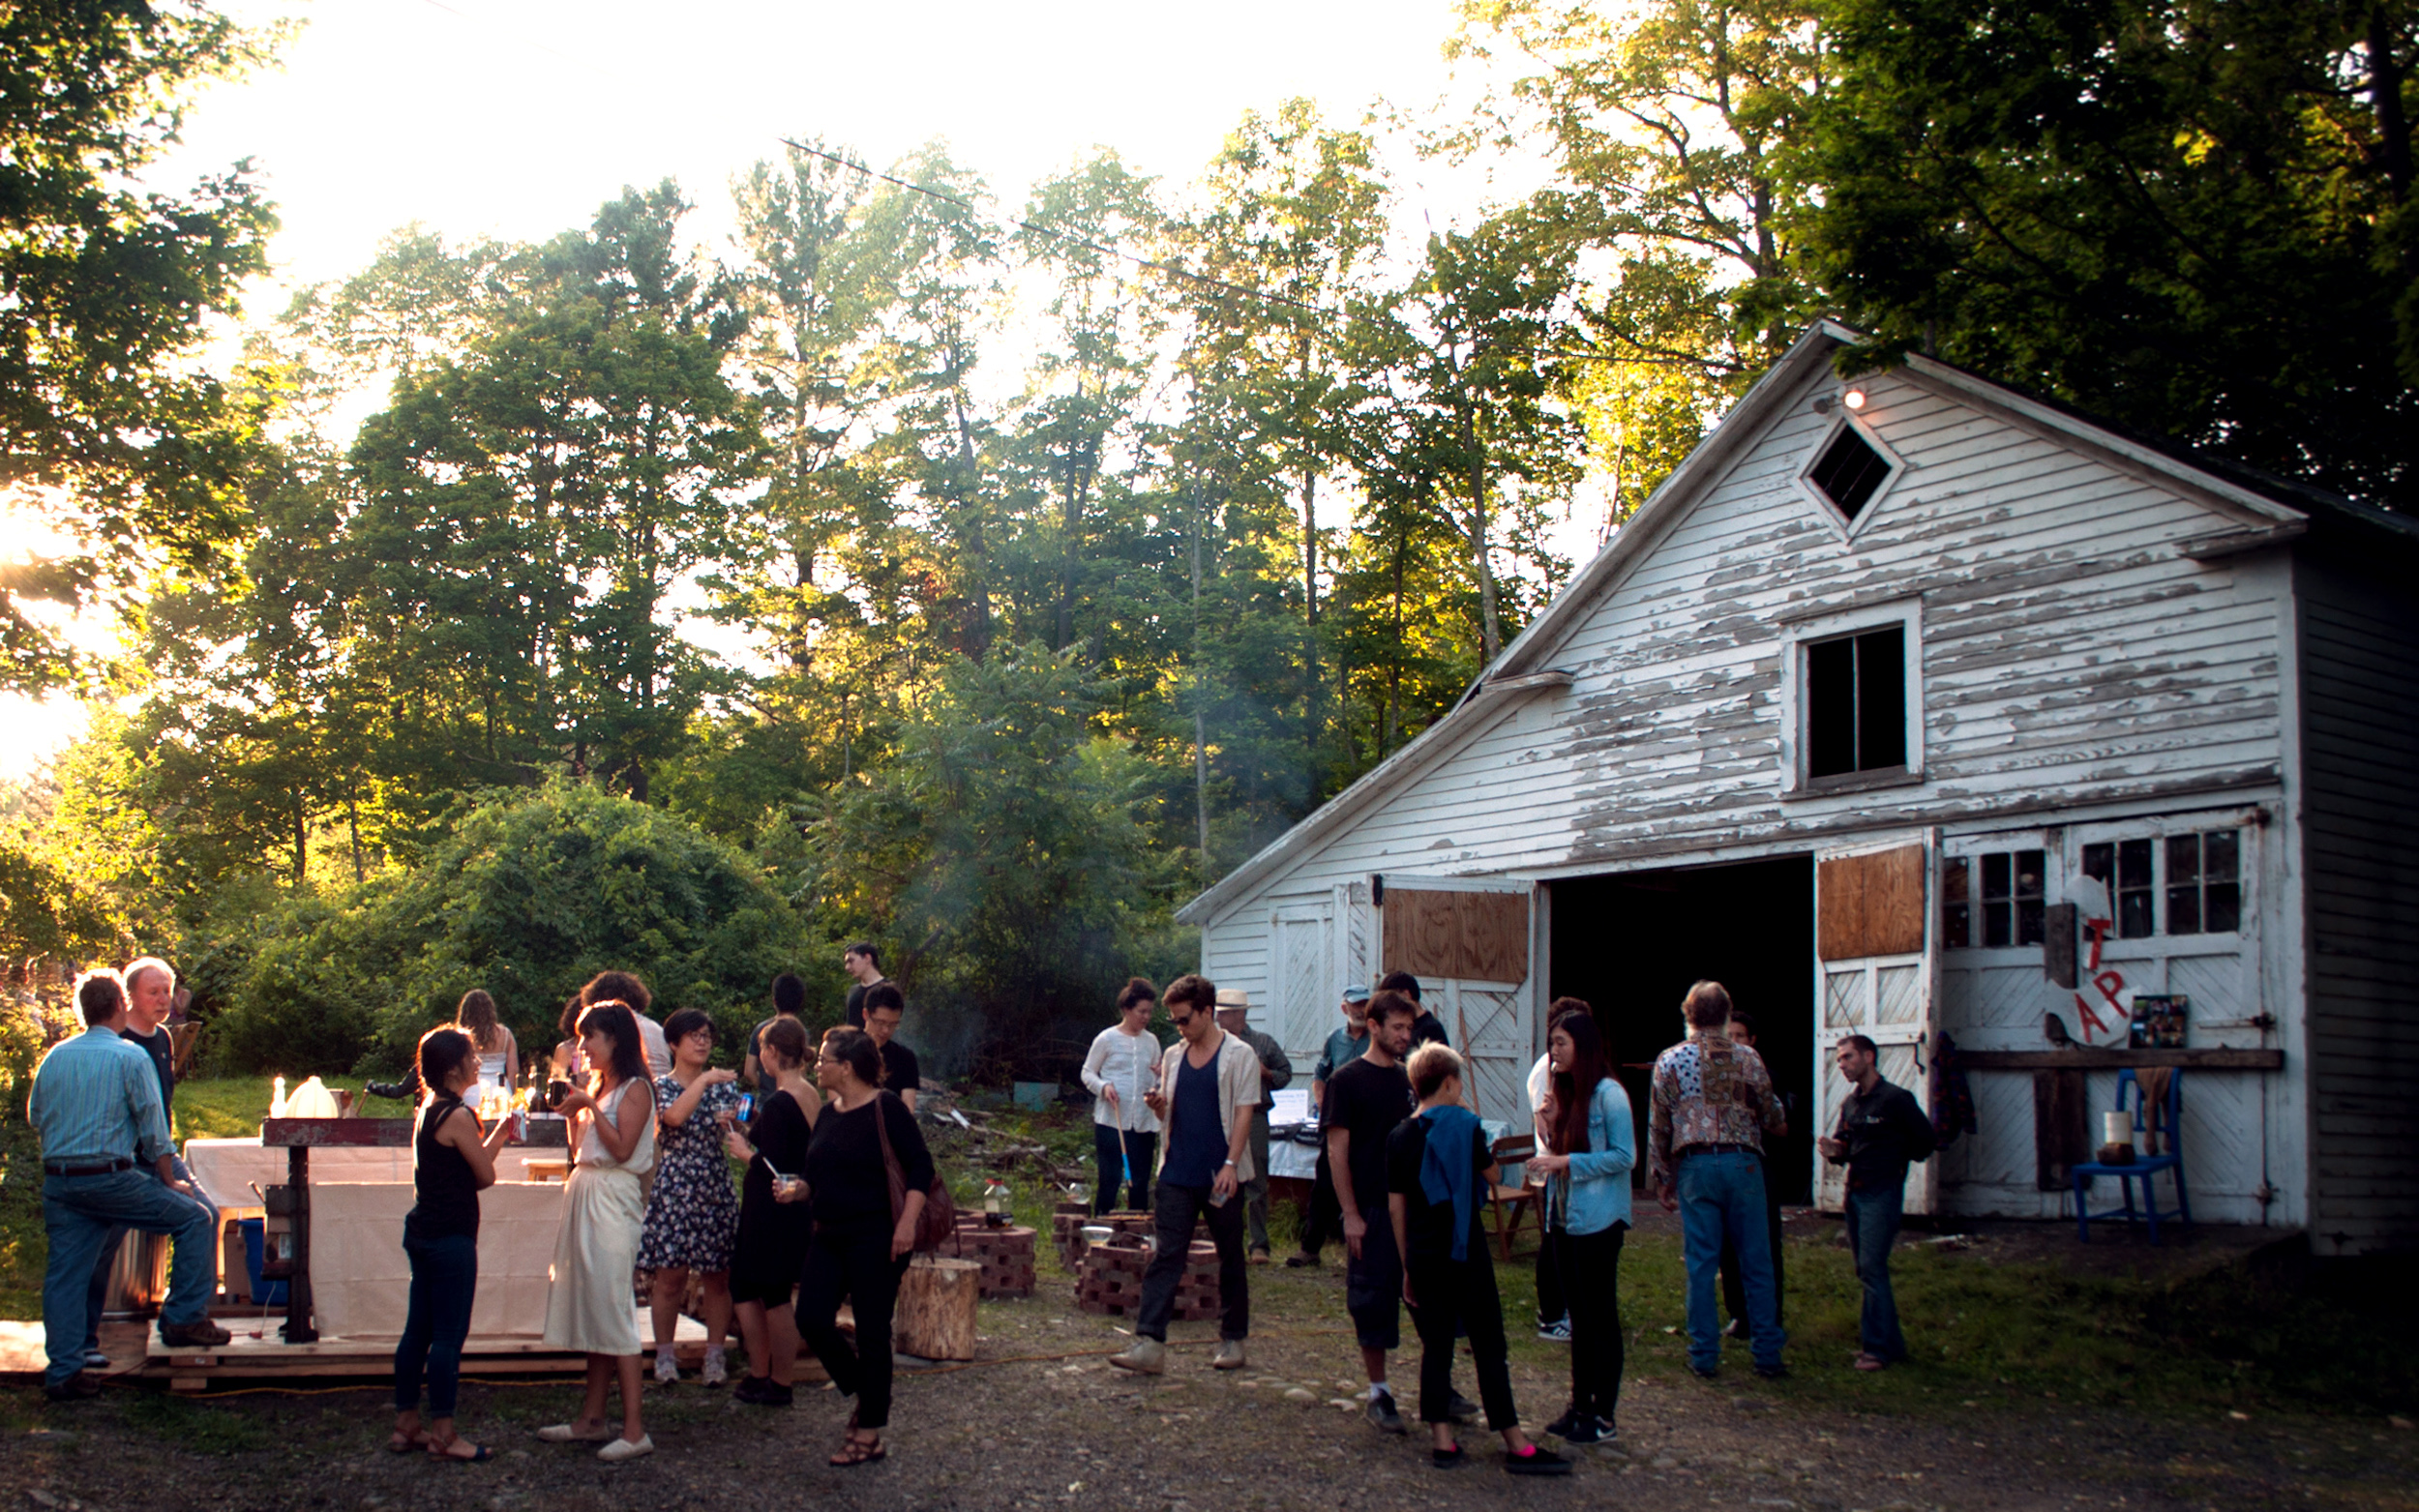 barn_outside_people_dinner.jpg